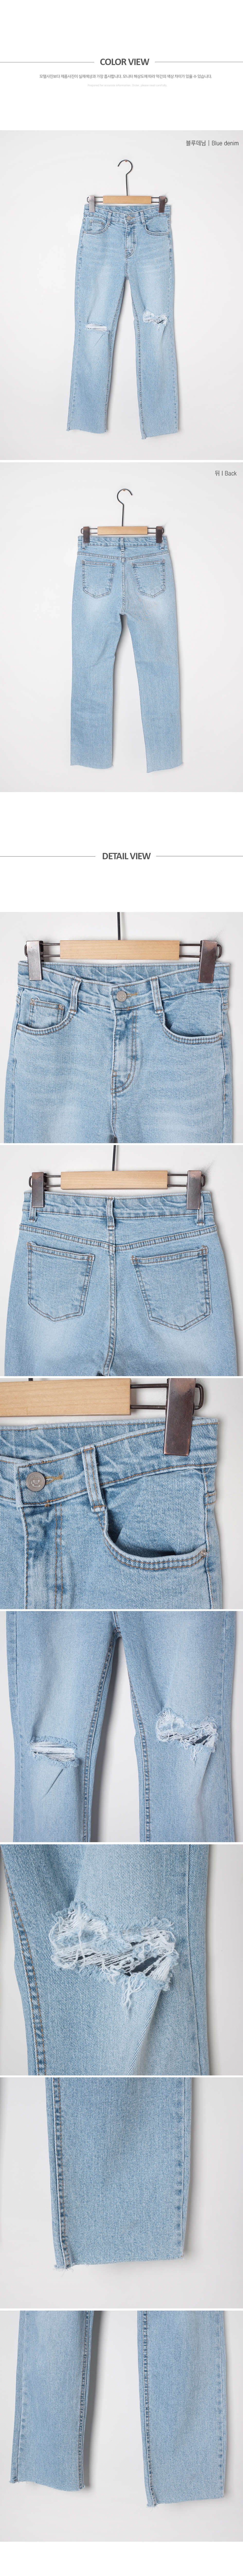 Sugar Damage Hidden Bending Denim Pants